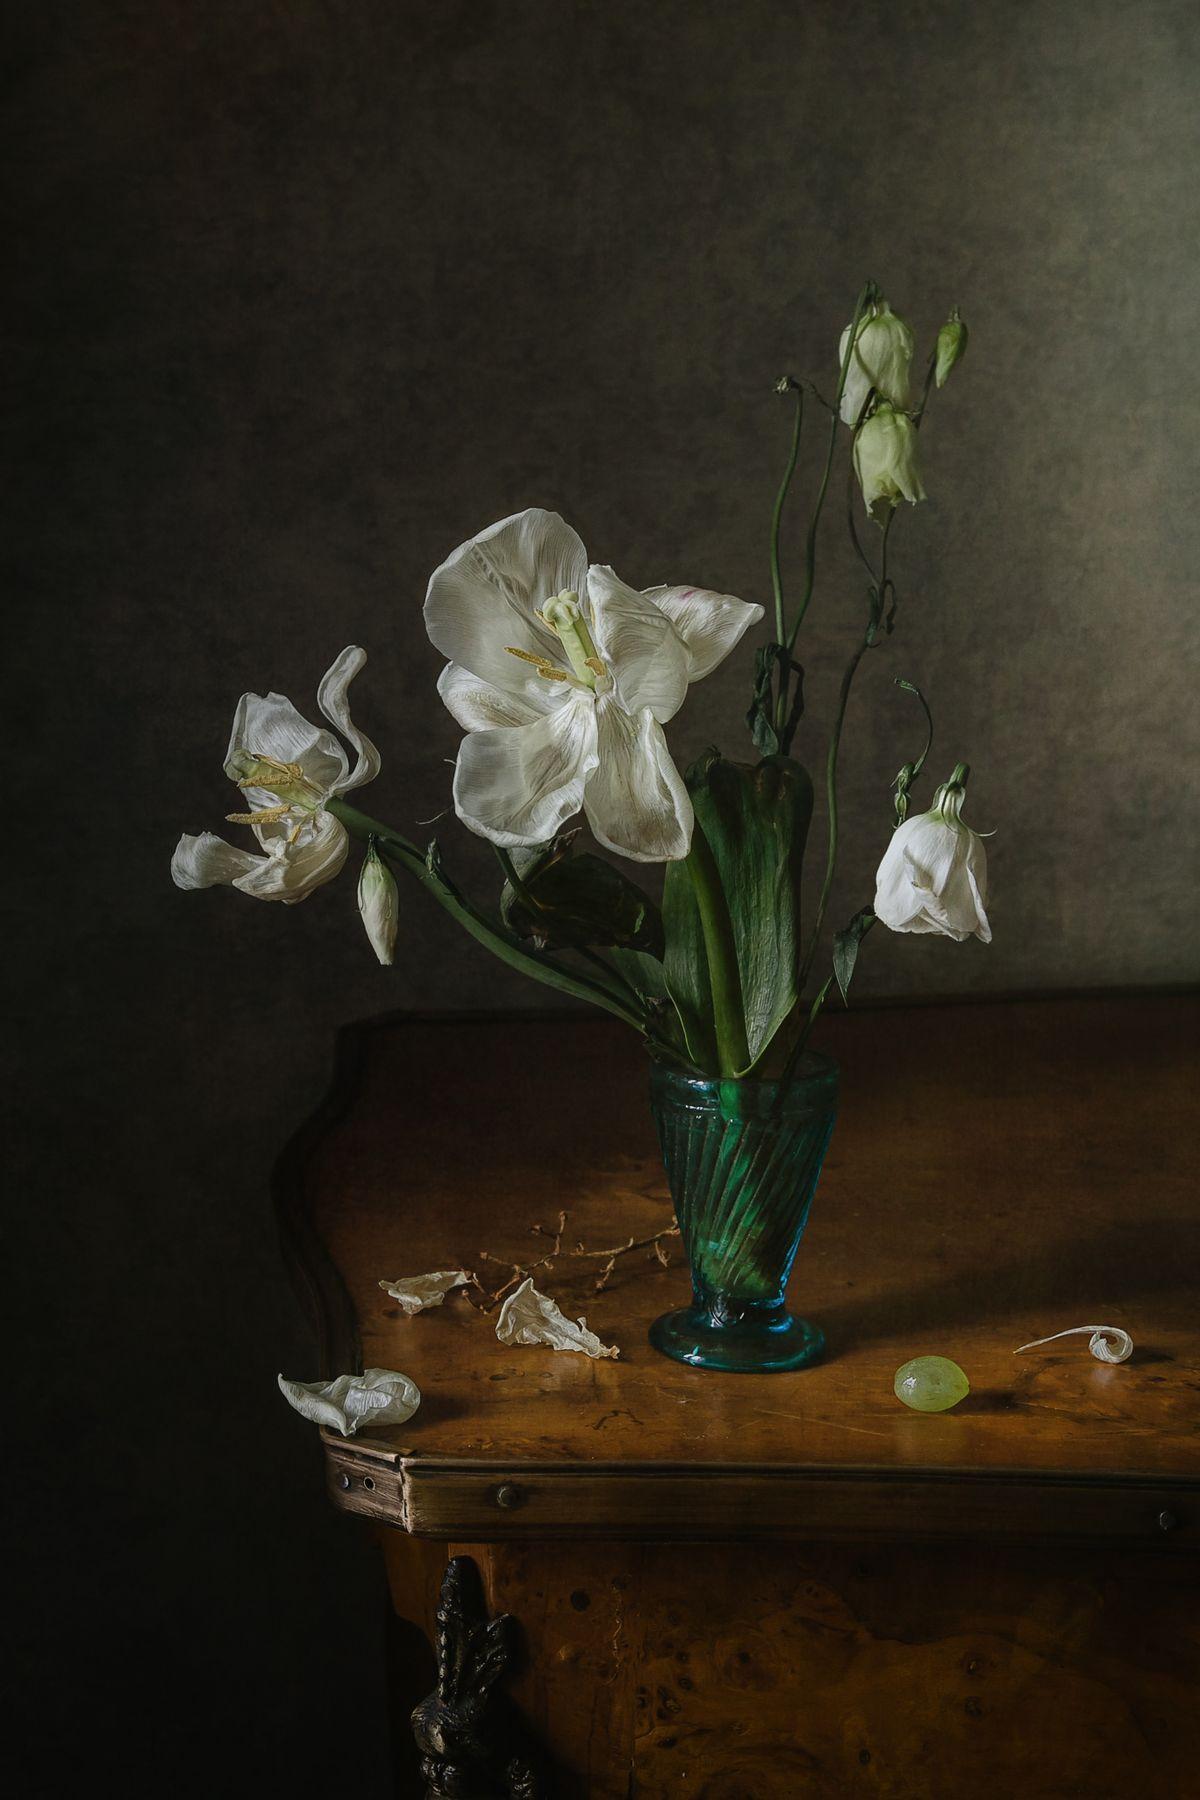 Белые лепестки натюрморт цветы тюльпан эустома